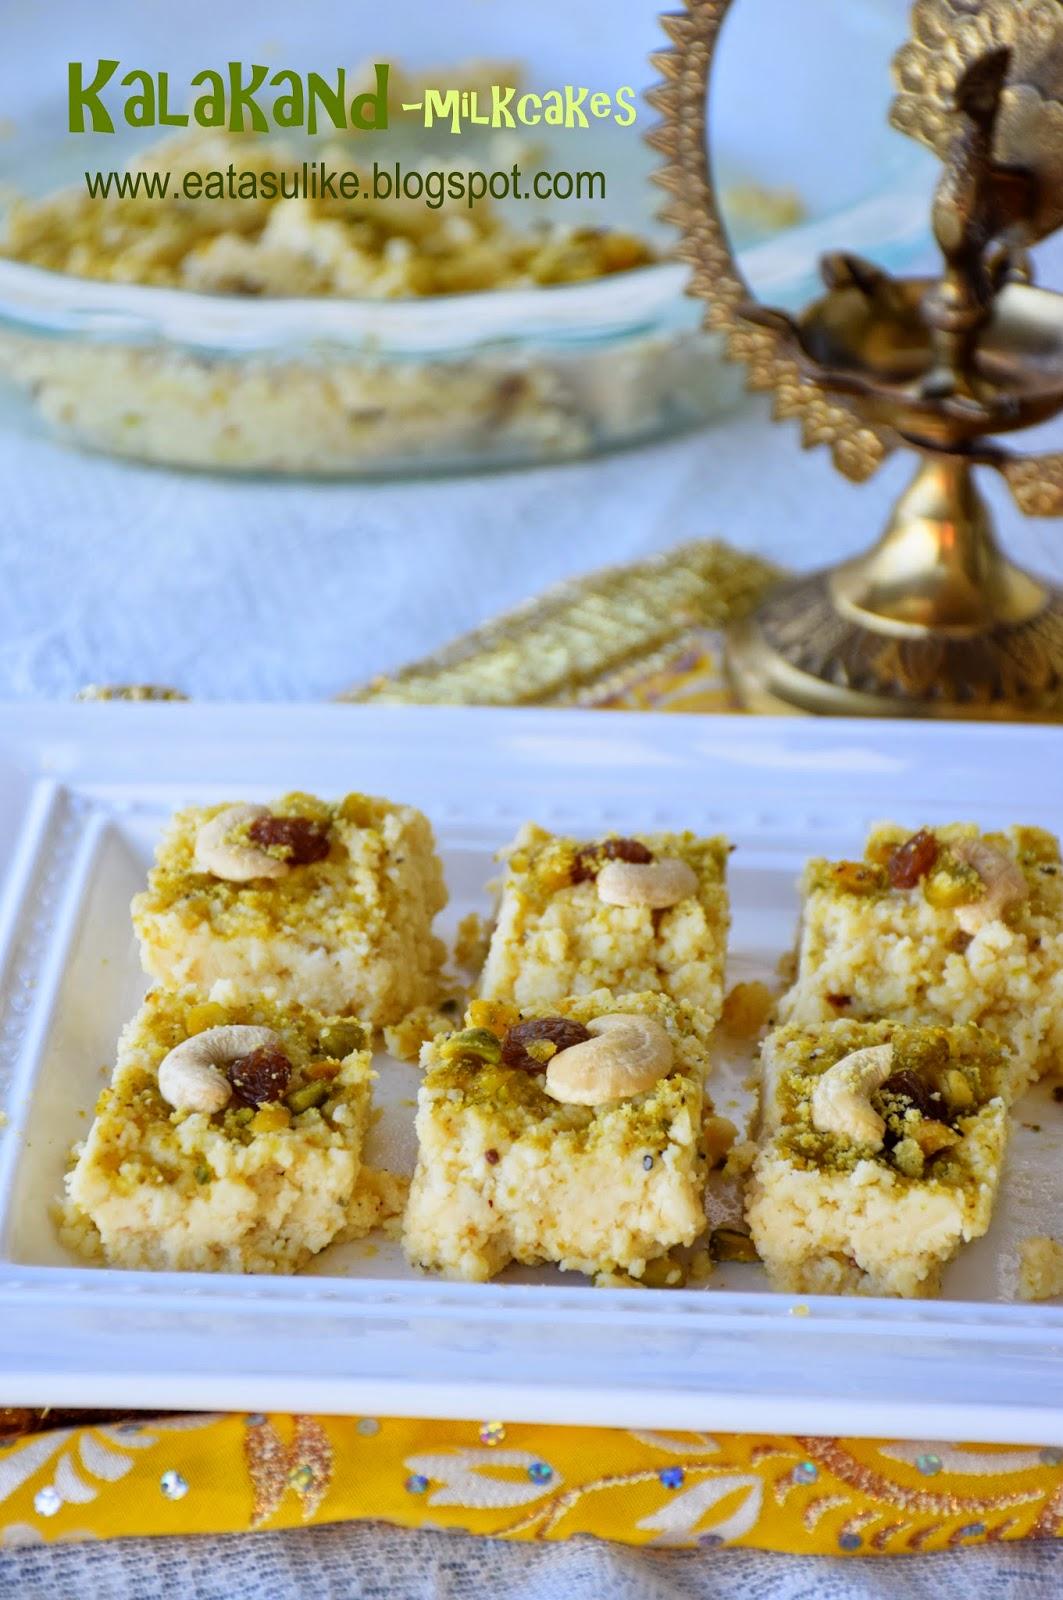 http://eatasulike.blogspot.com.au/2014/04/kalakand-milk-cake.html